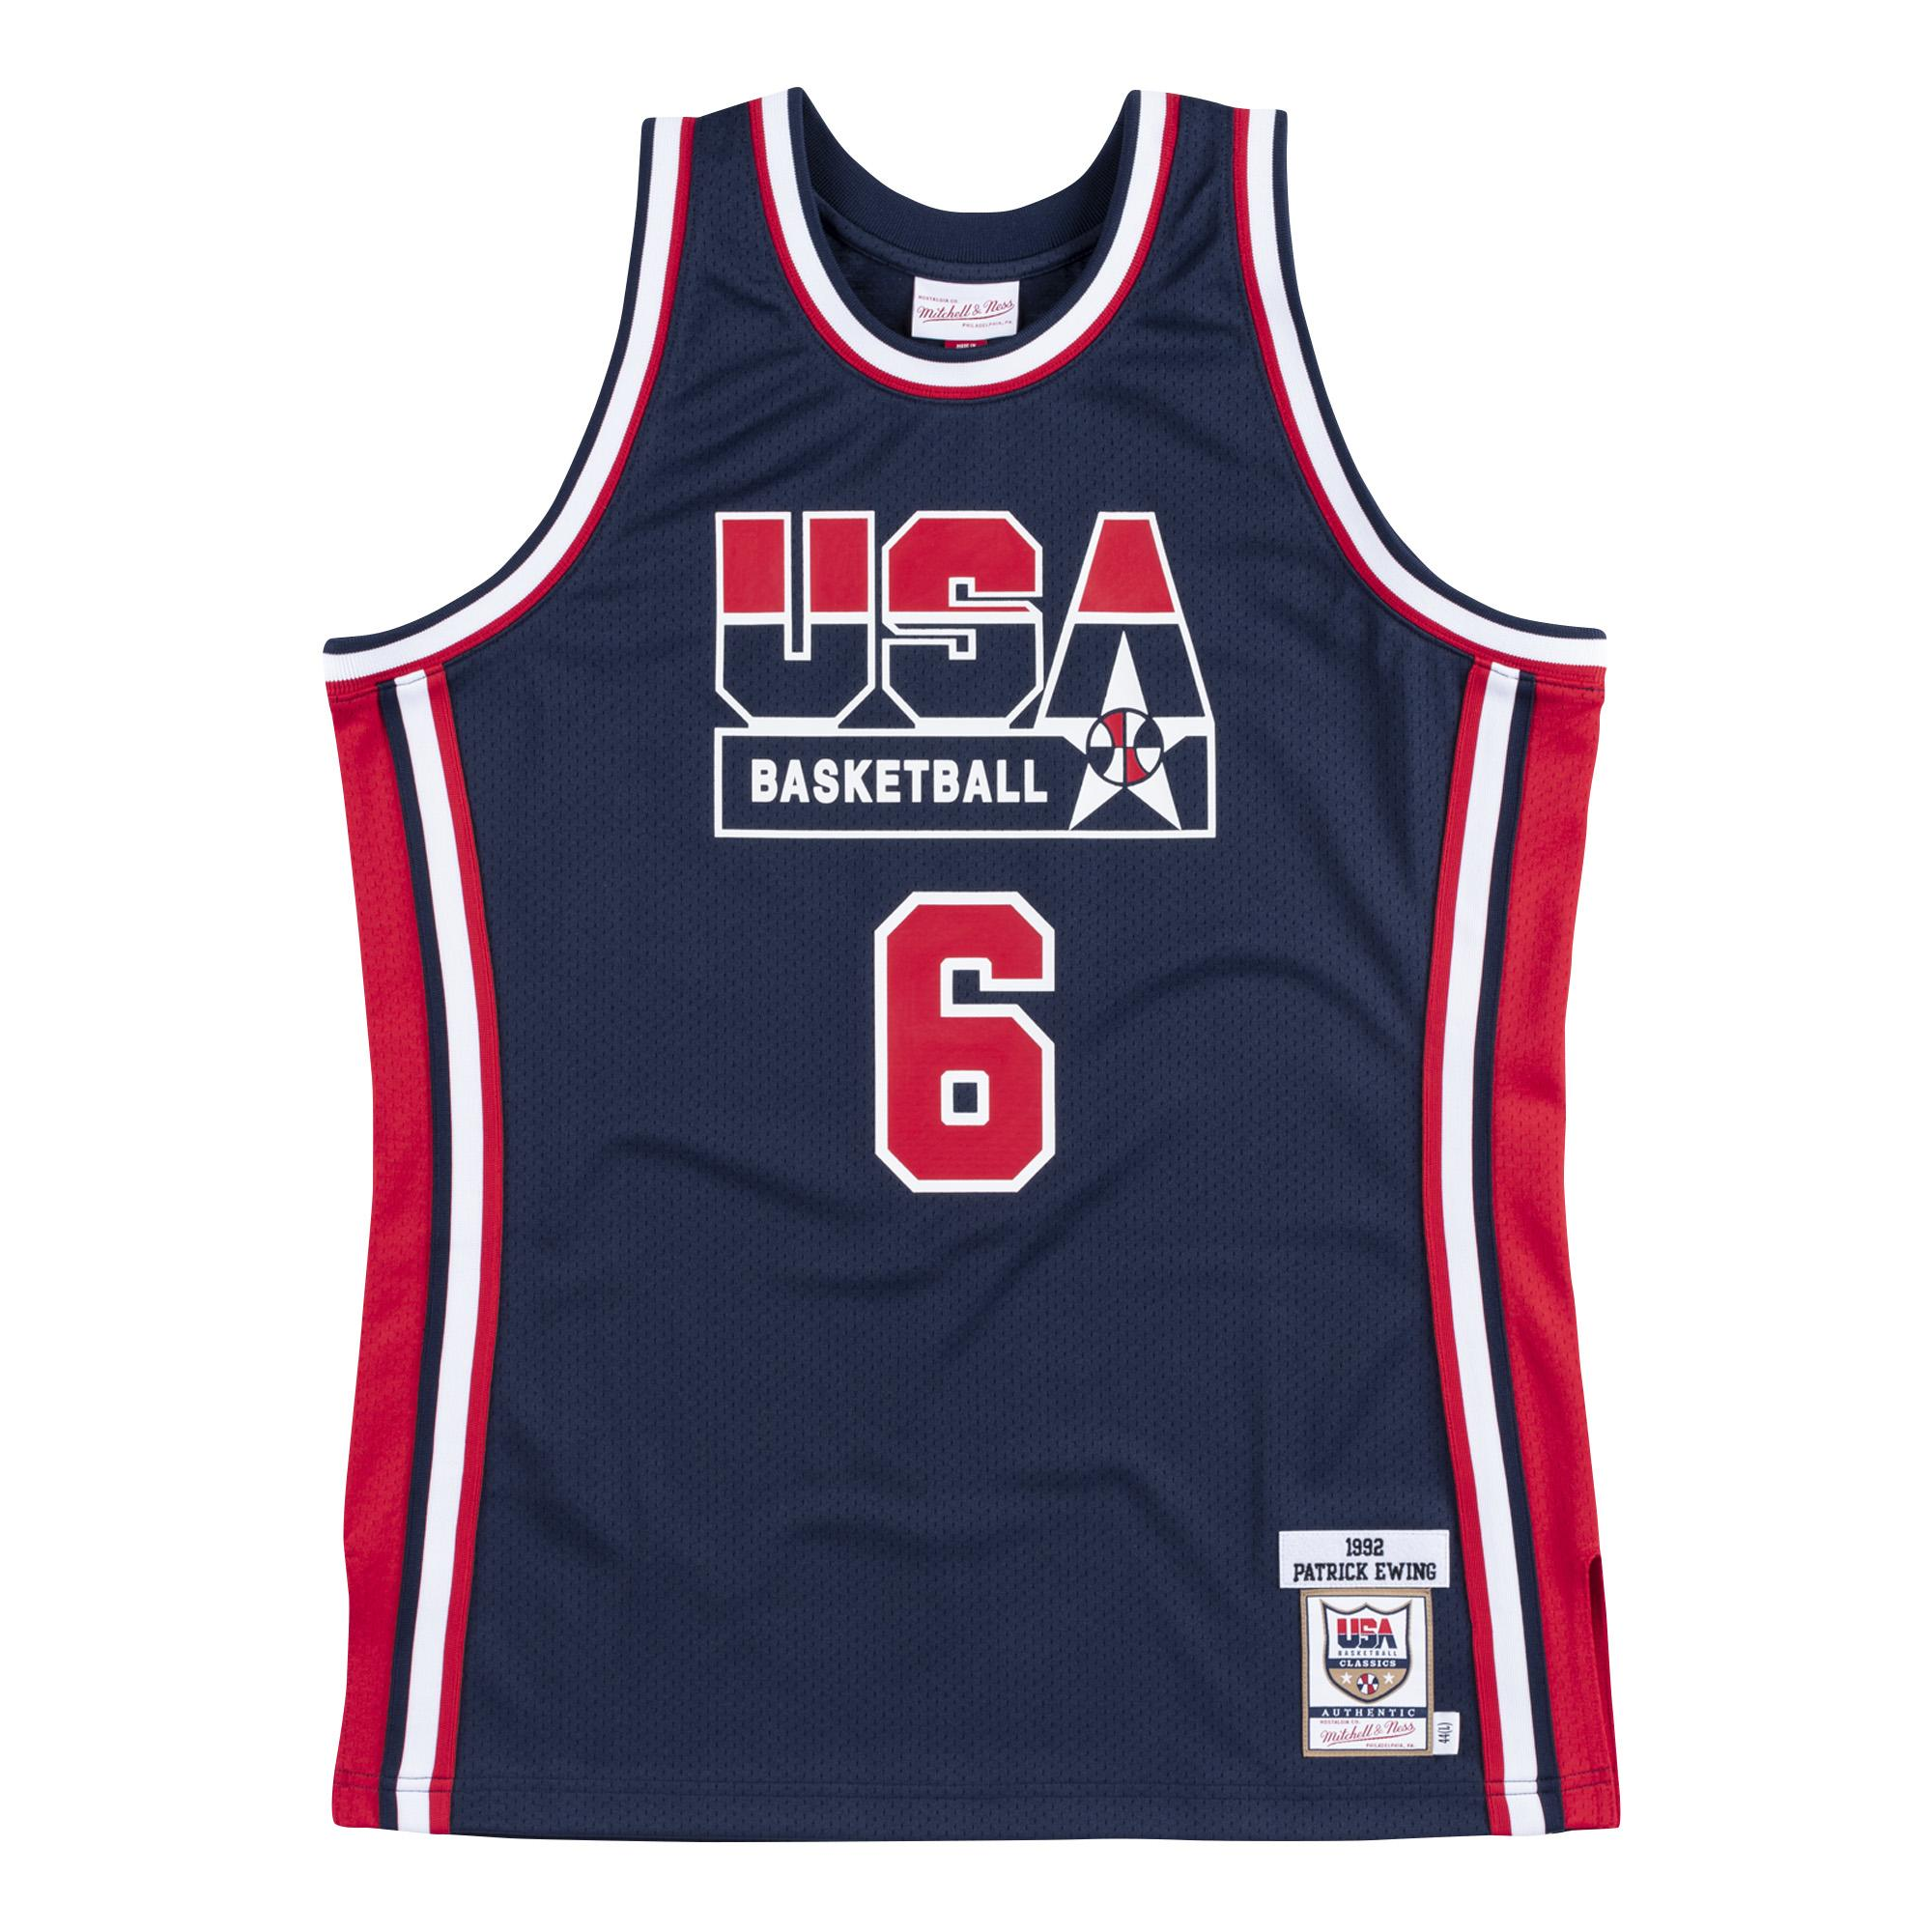 buy online b6479 de392 Mitchell & Ness | Team USA 1992 Authentic Jersey Patrick Ewing